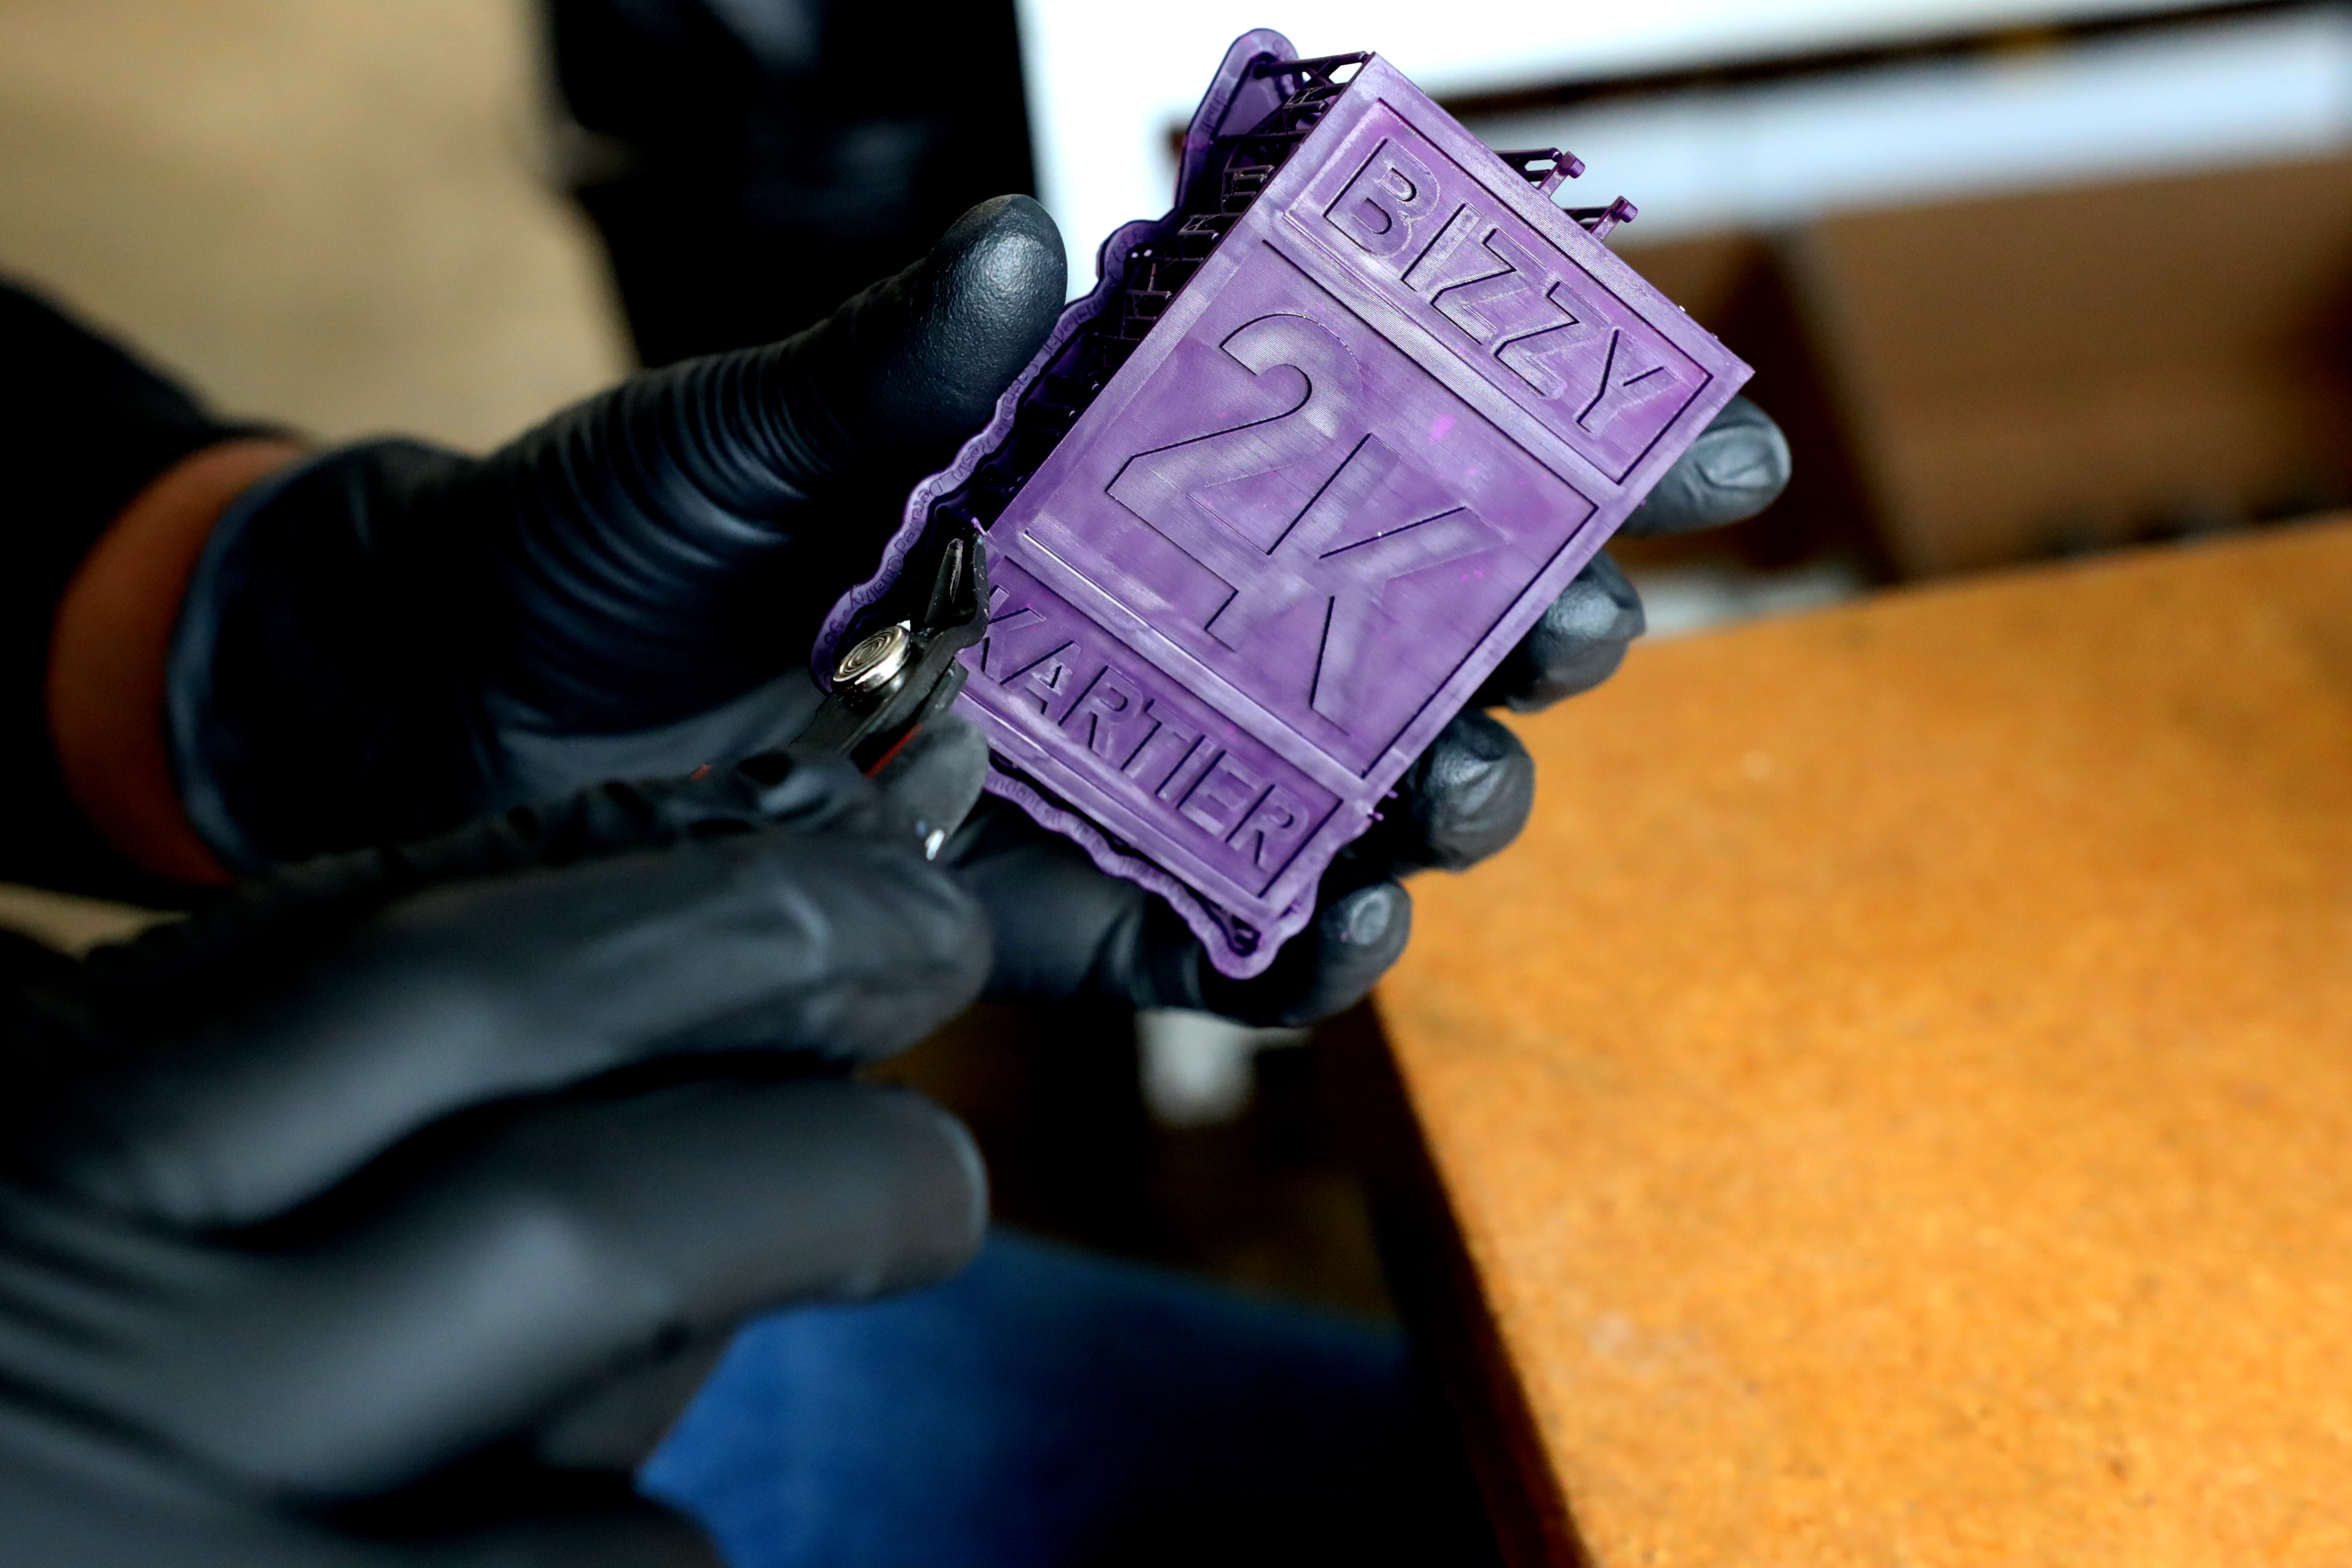 3D Printing Materials - Castable Wax Resin - Makelab - Jewelry Process Photo